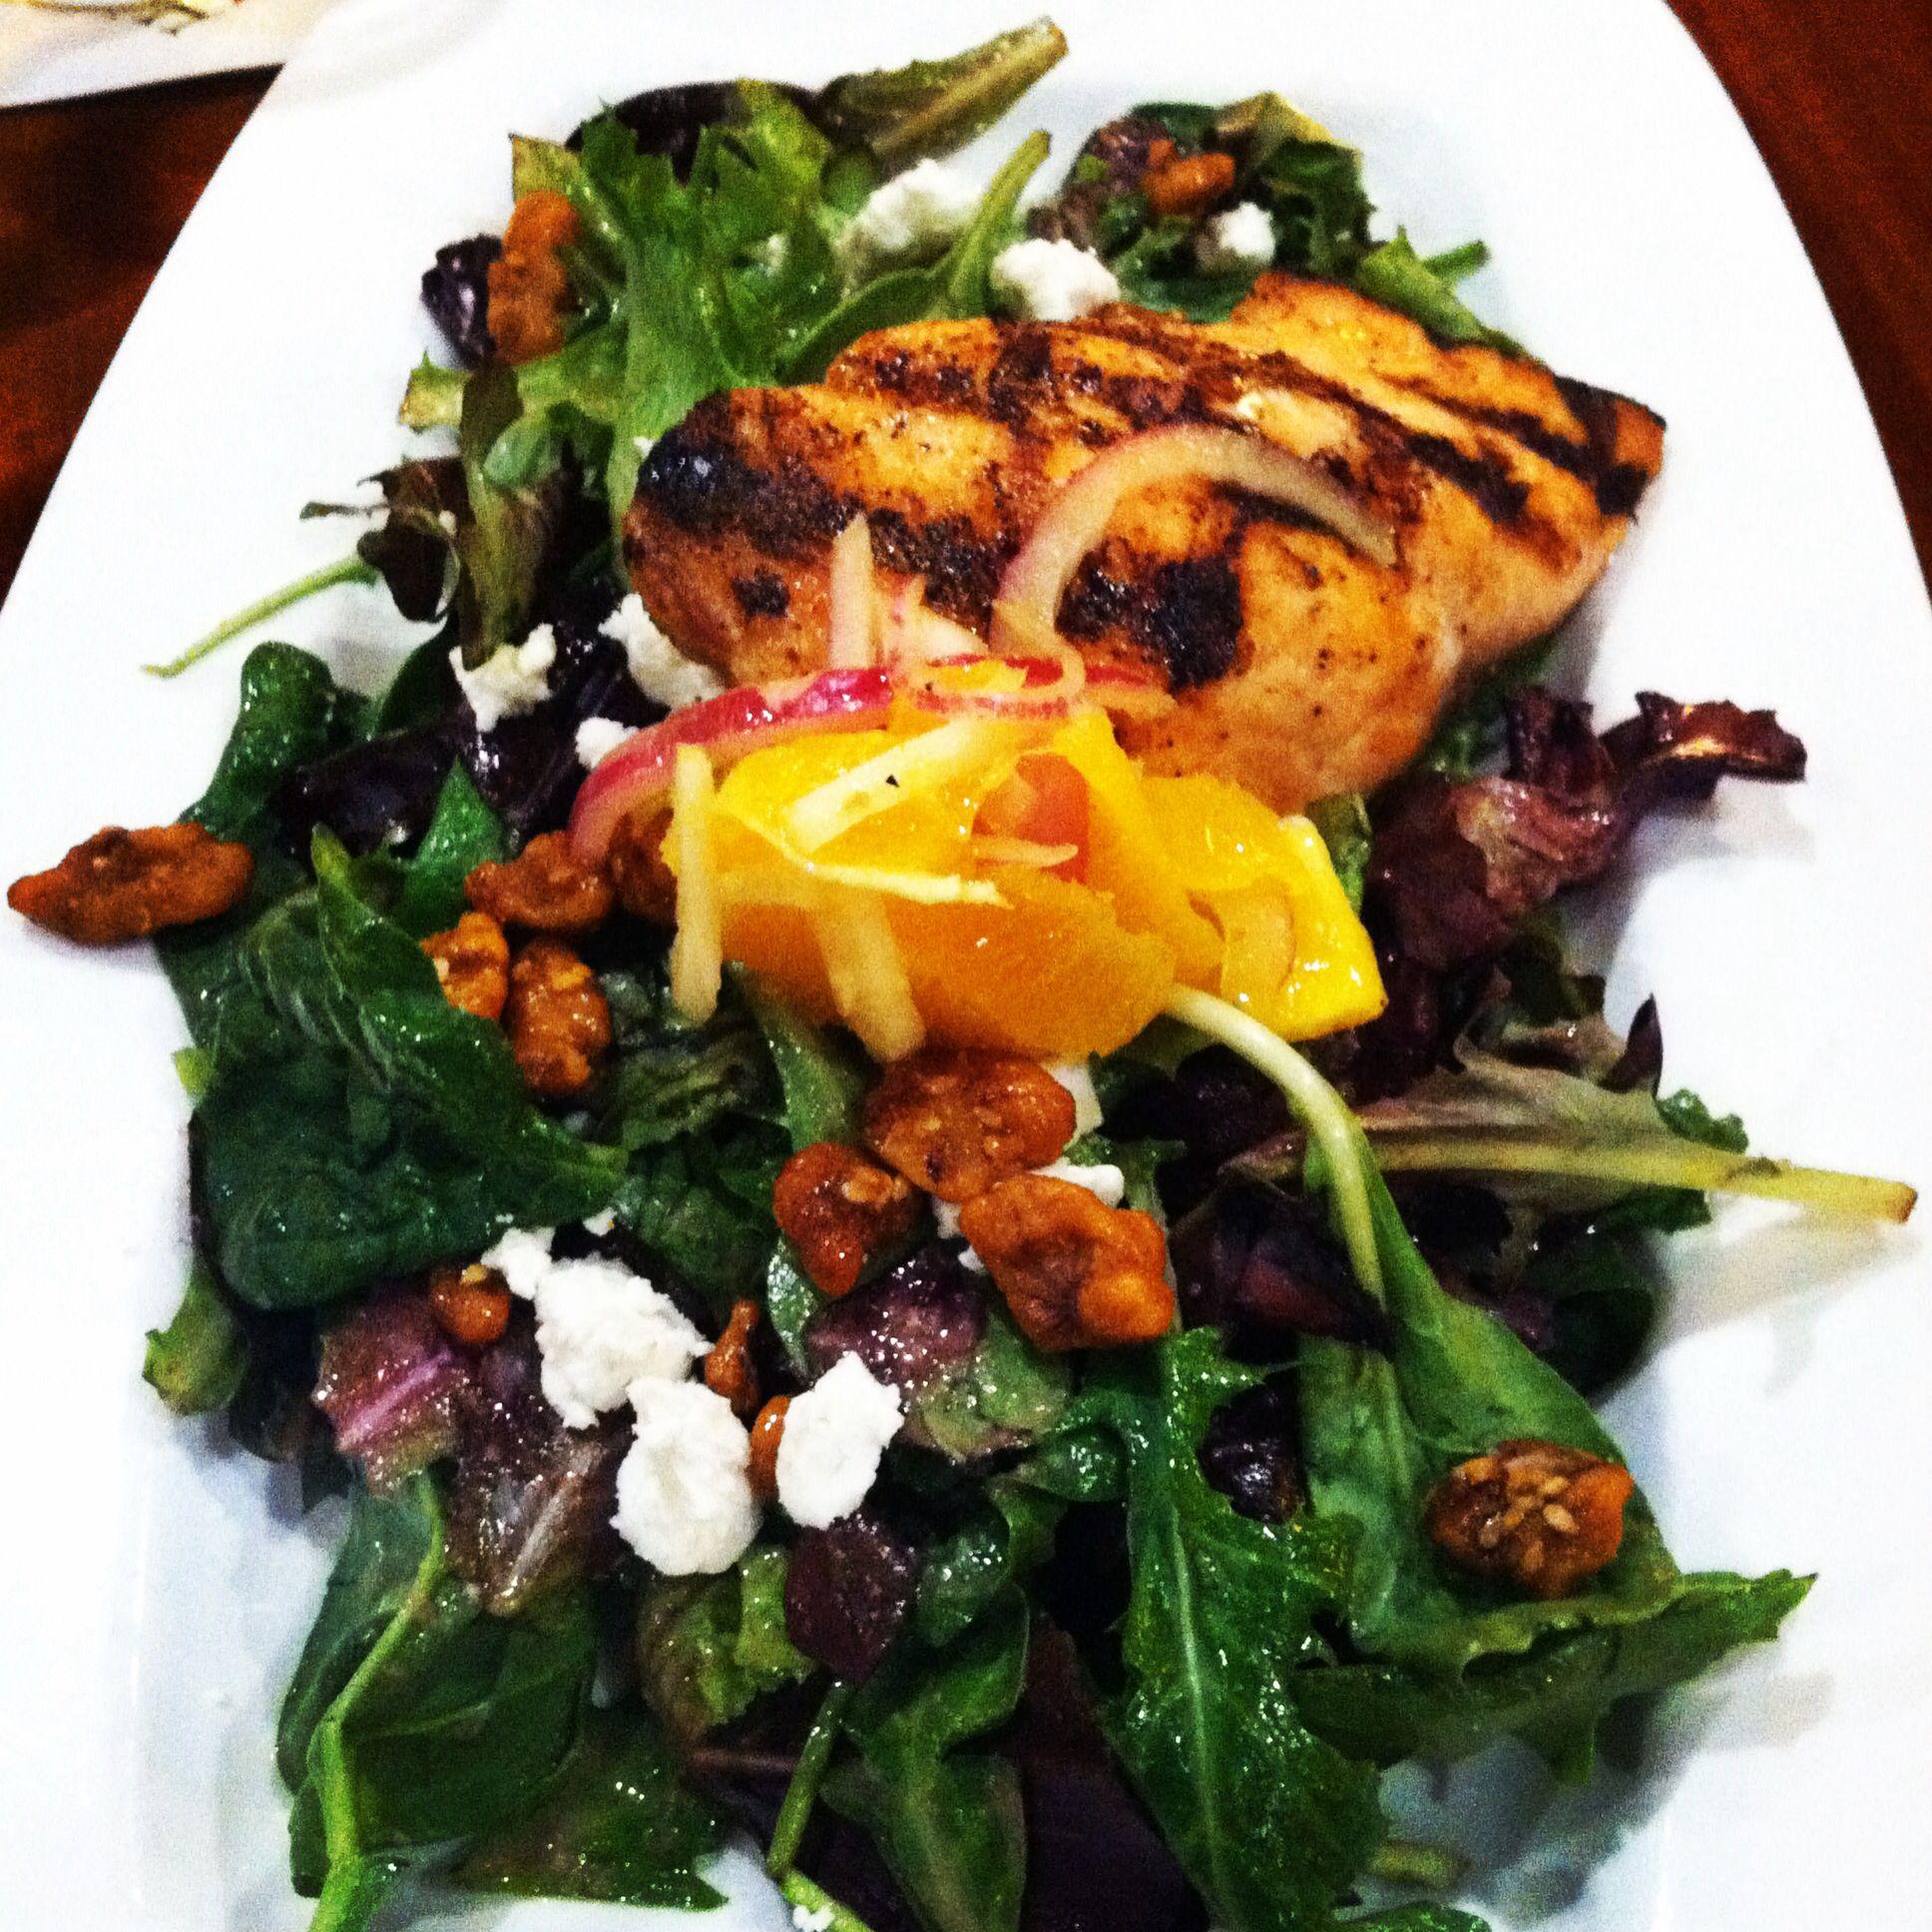 Day 14! Salmon salad! @Andrea Tate cinci